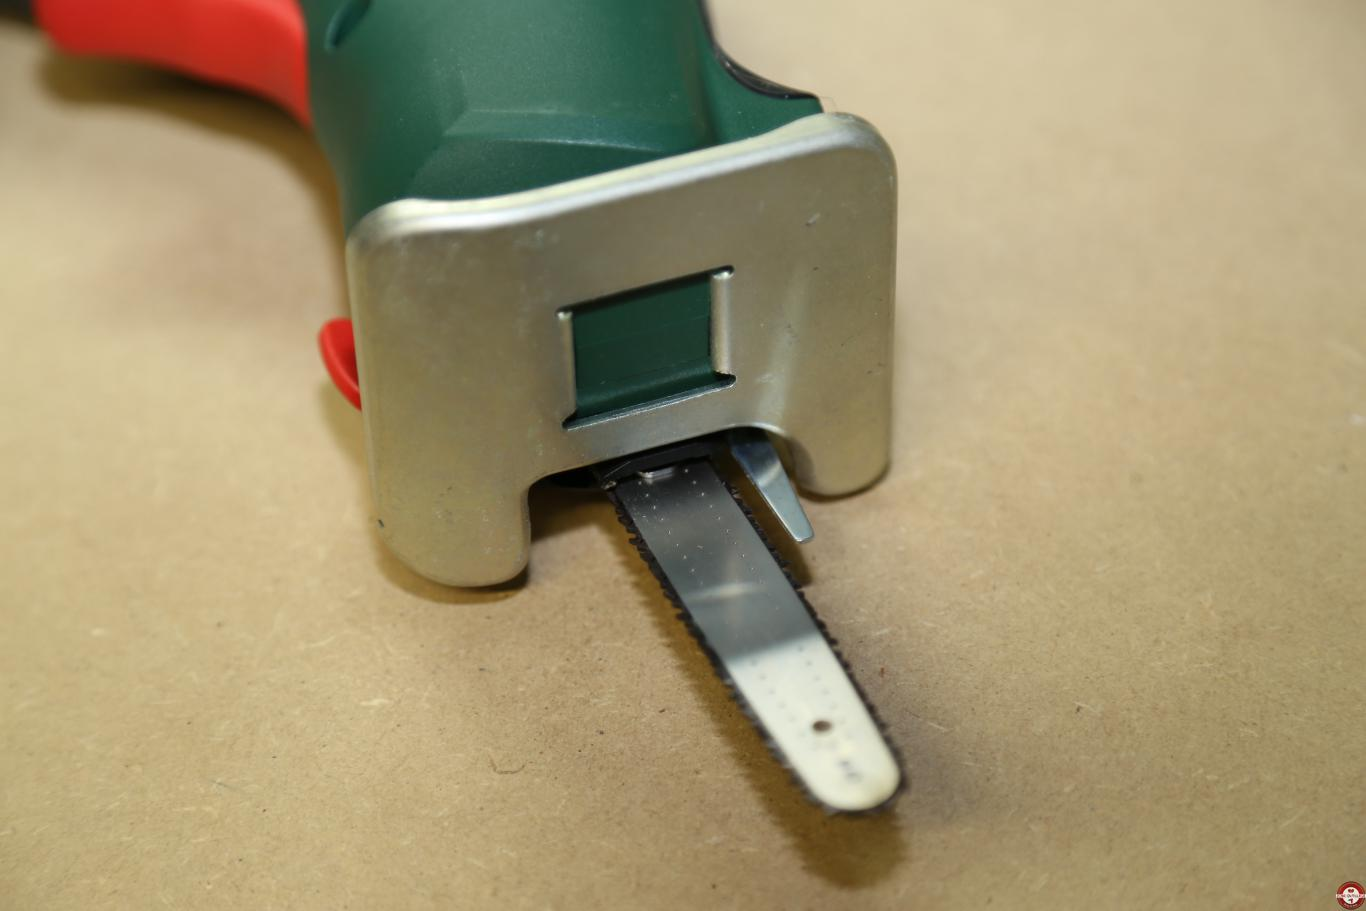 Scie sans fil EasyCut 12 Bosch à lame NanoBlade © Zone Outillage - Benjamin Leharivel